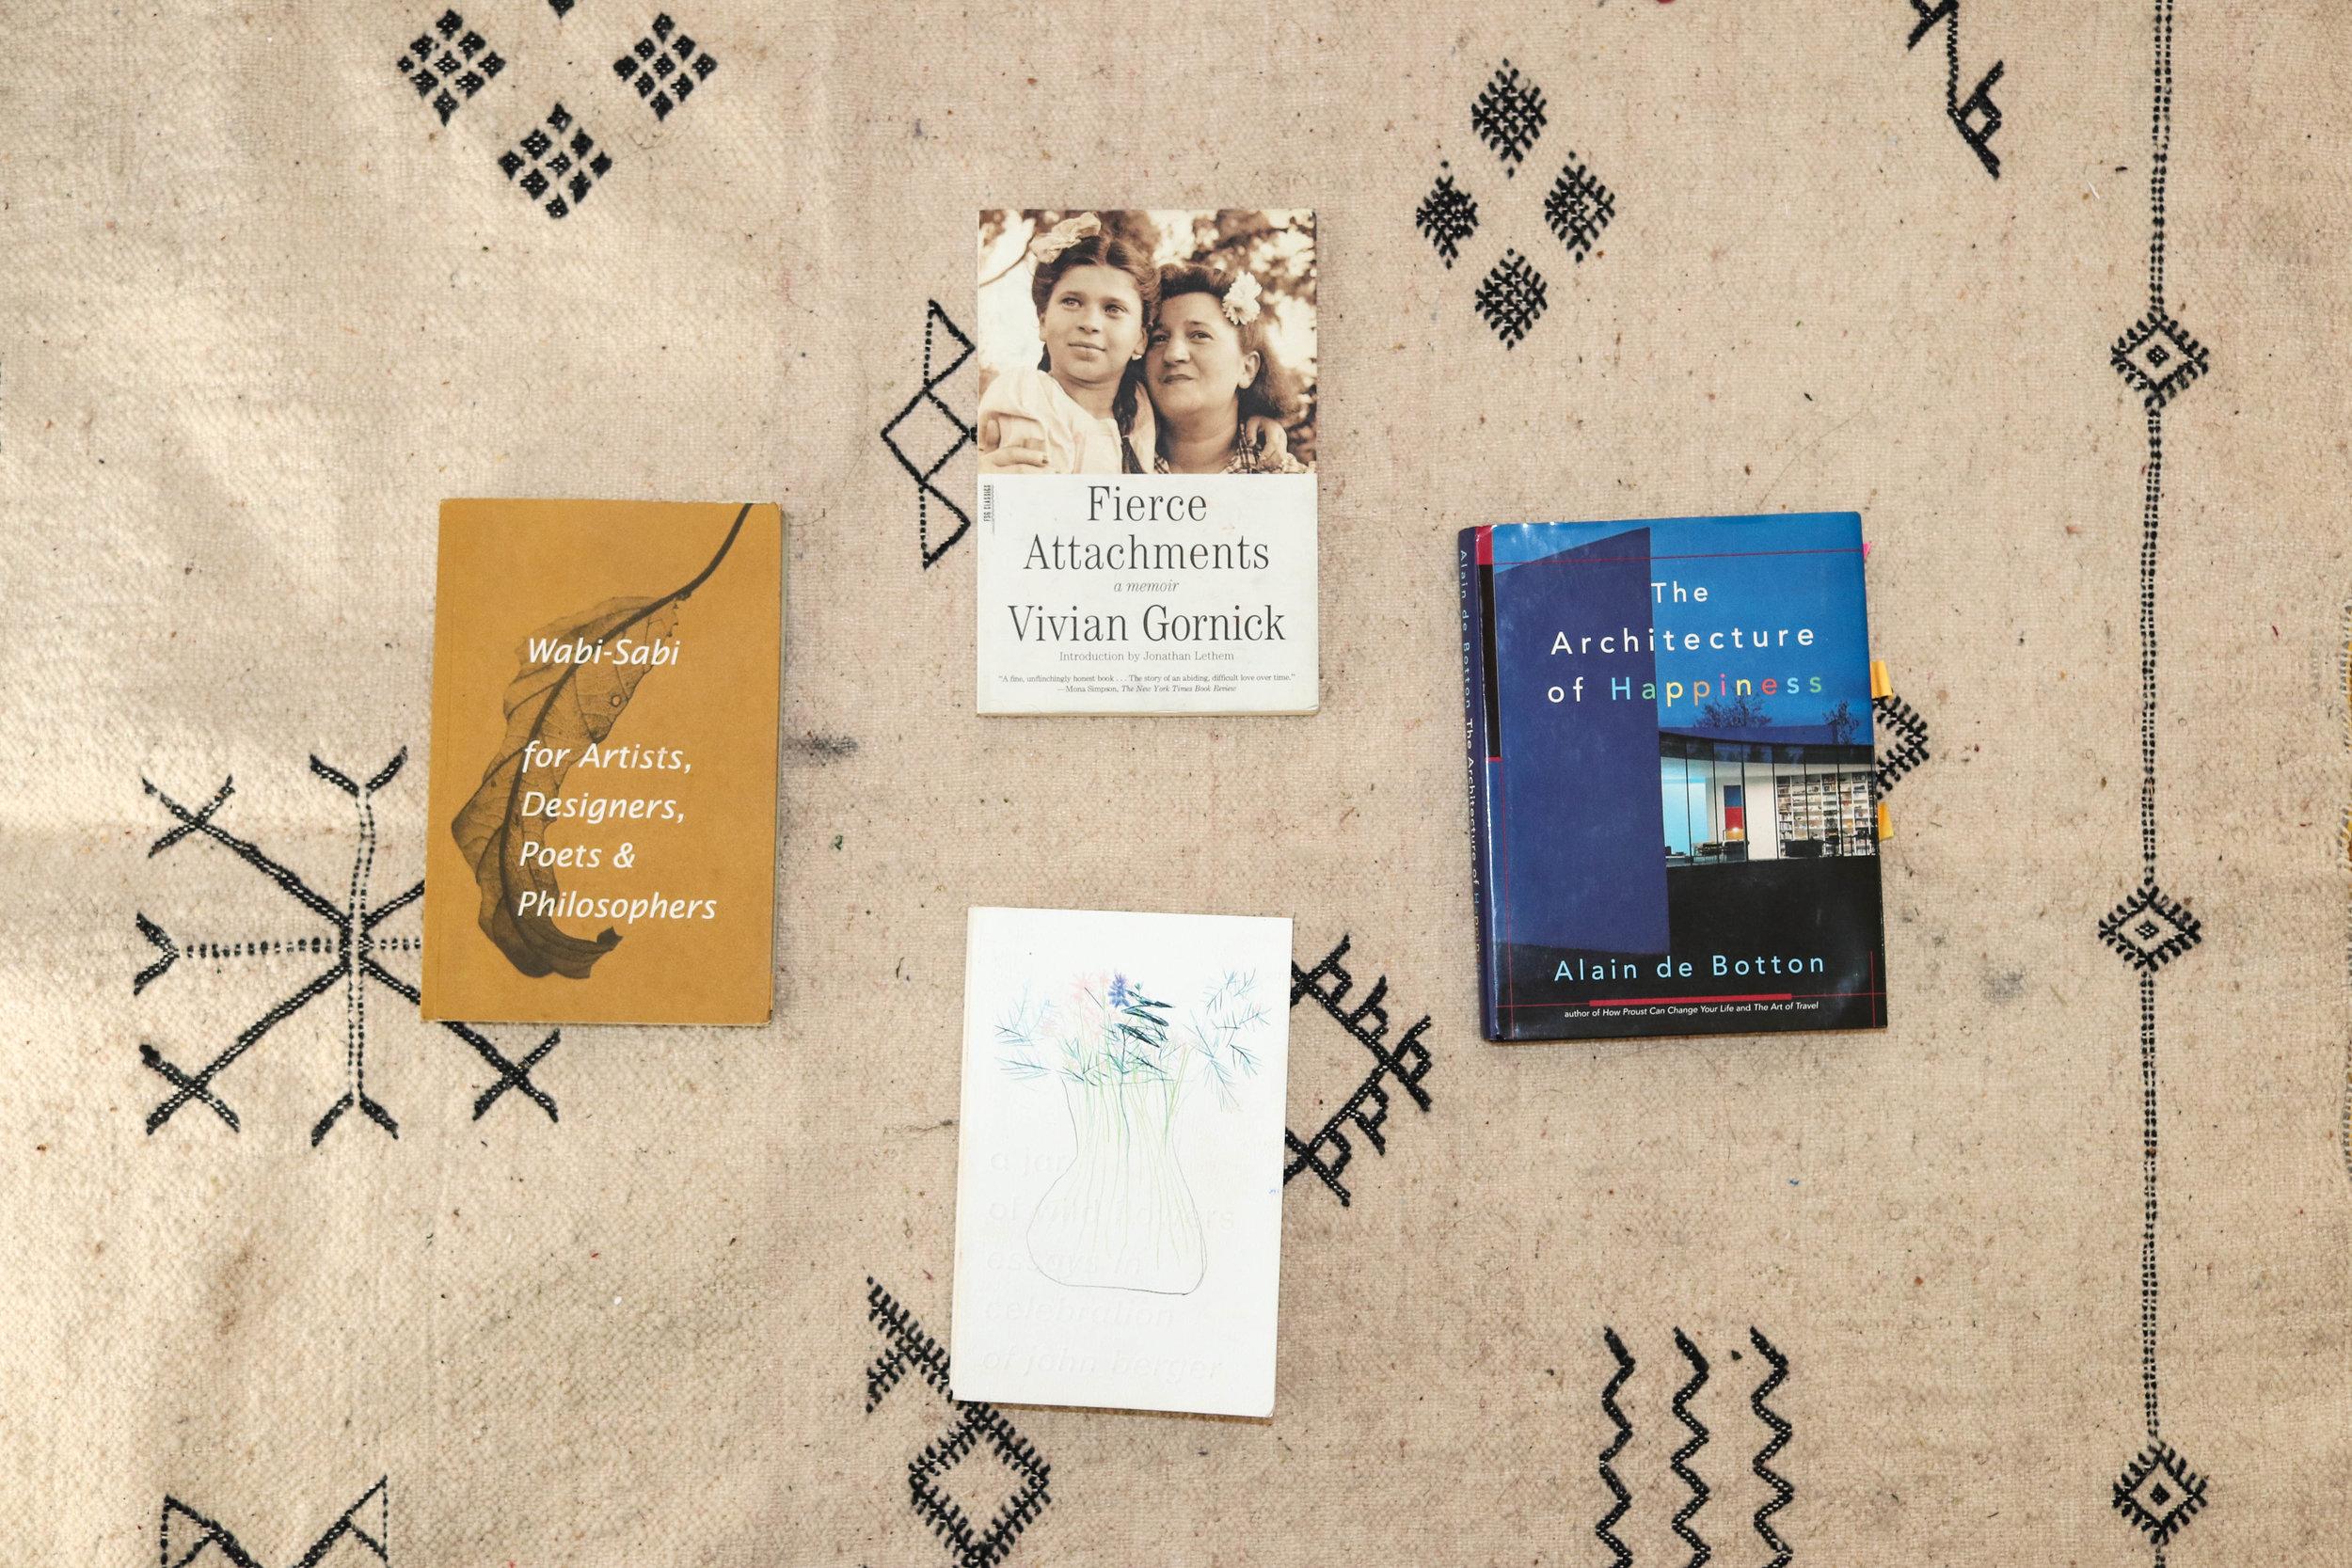 The Architecture of Happiness    by Alain de Botton,    Fierce Attachments    by Vivian Gornick,    Wabi-Sabi for Artists, Designers, Poets & Philosophers    by Leonard Koren